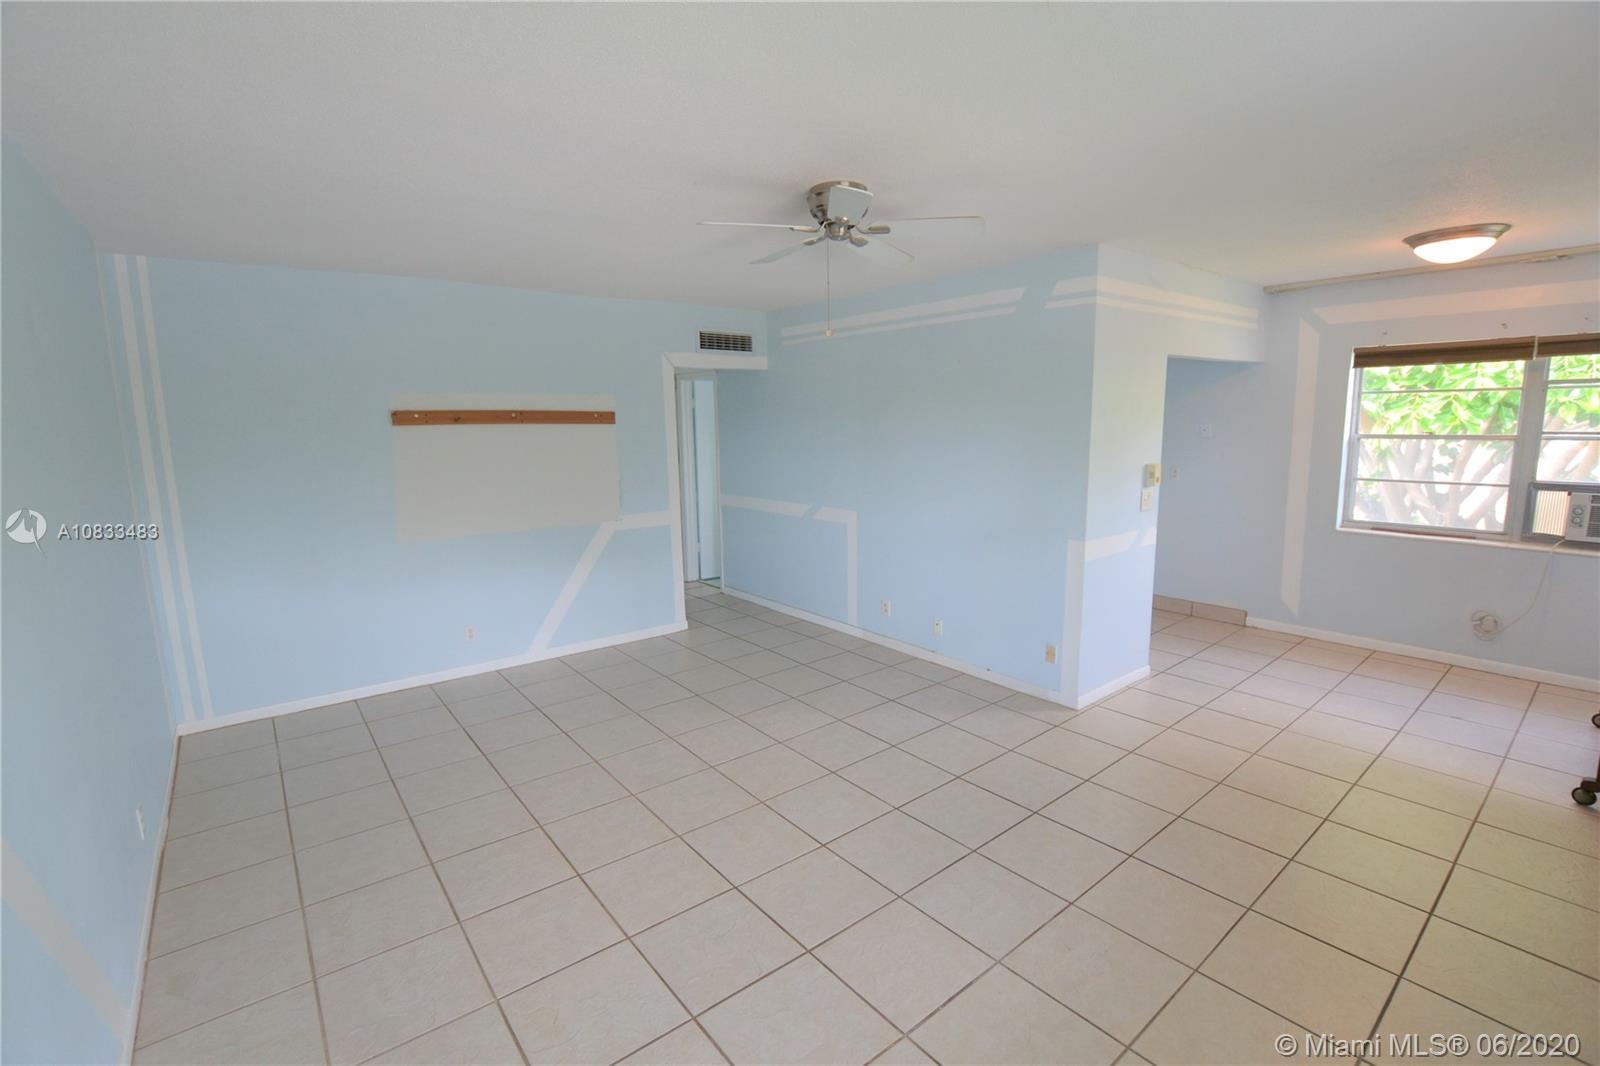 133 Coventry F, West Palm Beach, FL 33417